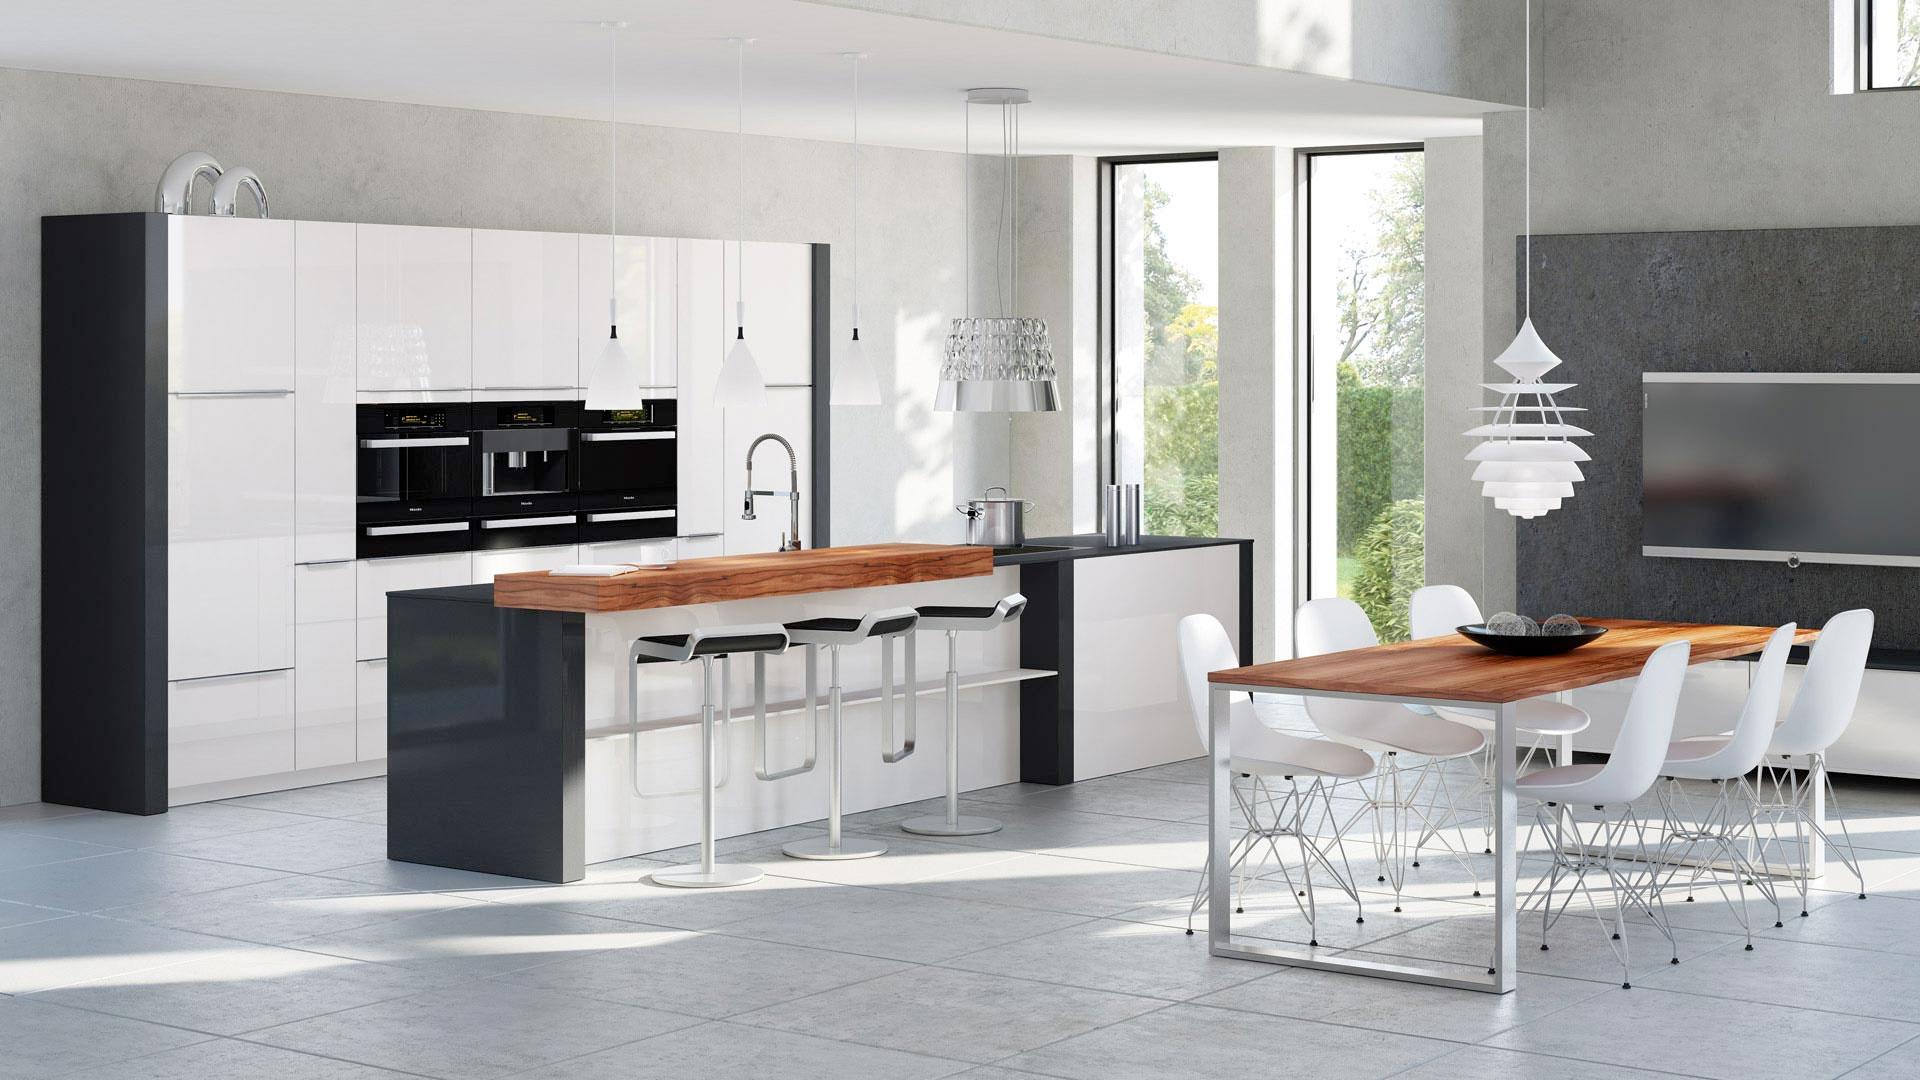 sachsenk chen butter k chenstudio dresden. Black Bedroom Furniture Sets. Home Design Ideas